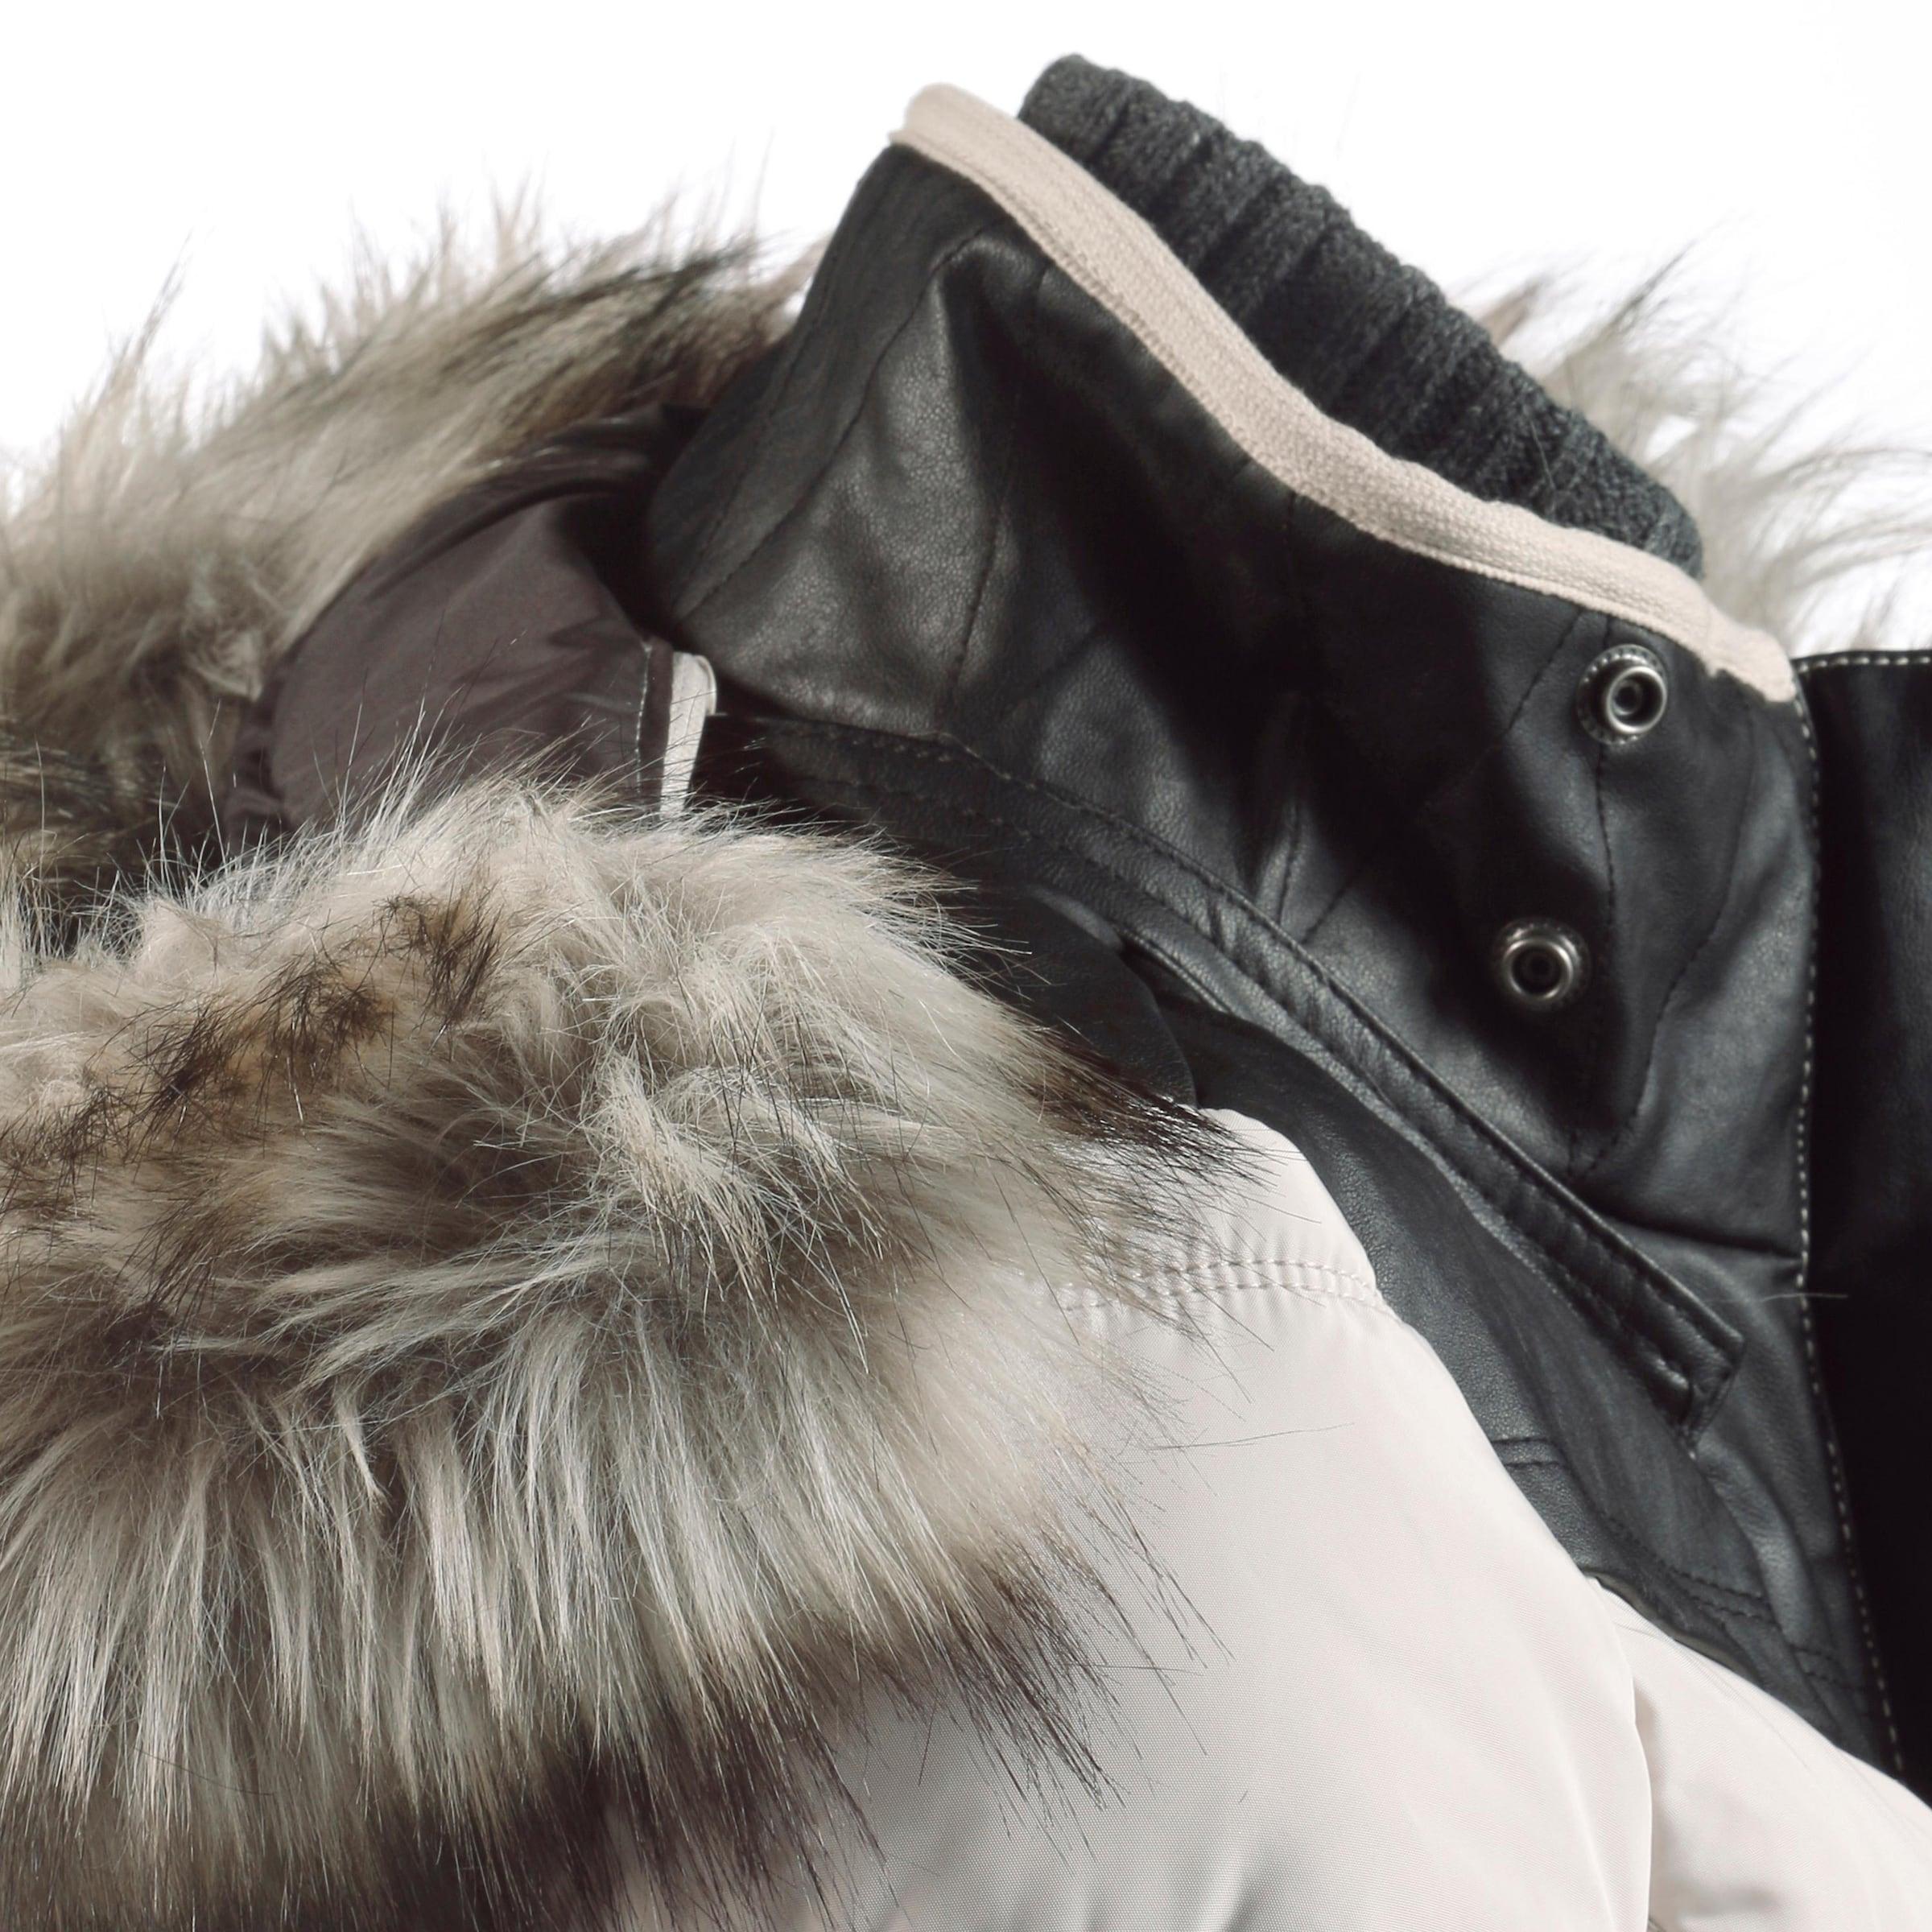 khujo Khujo 'WINSEN II WITH RIB COLLAR' Kapuzenjacke Damen Günstiger Preis Auslass Verkauf vgihiJO